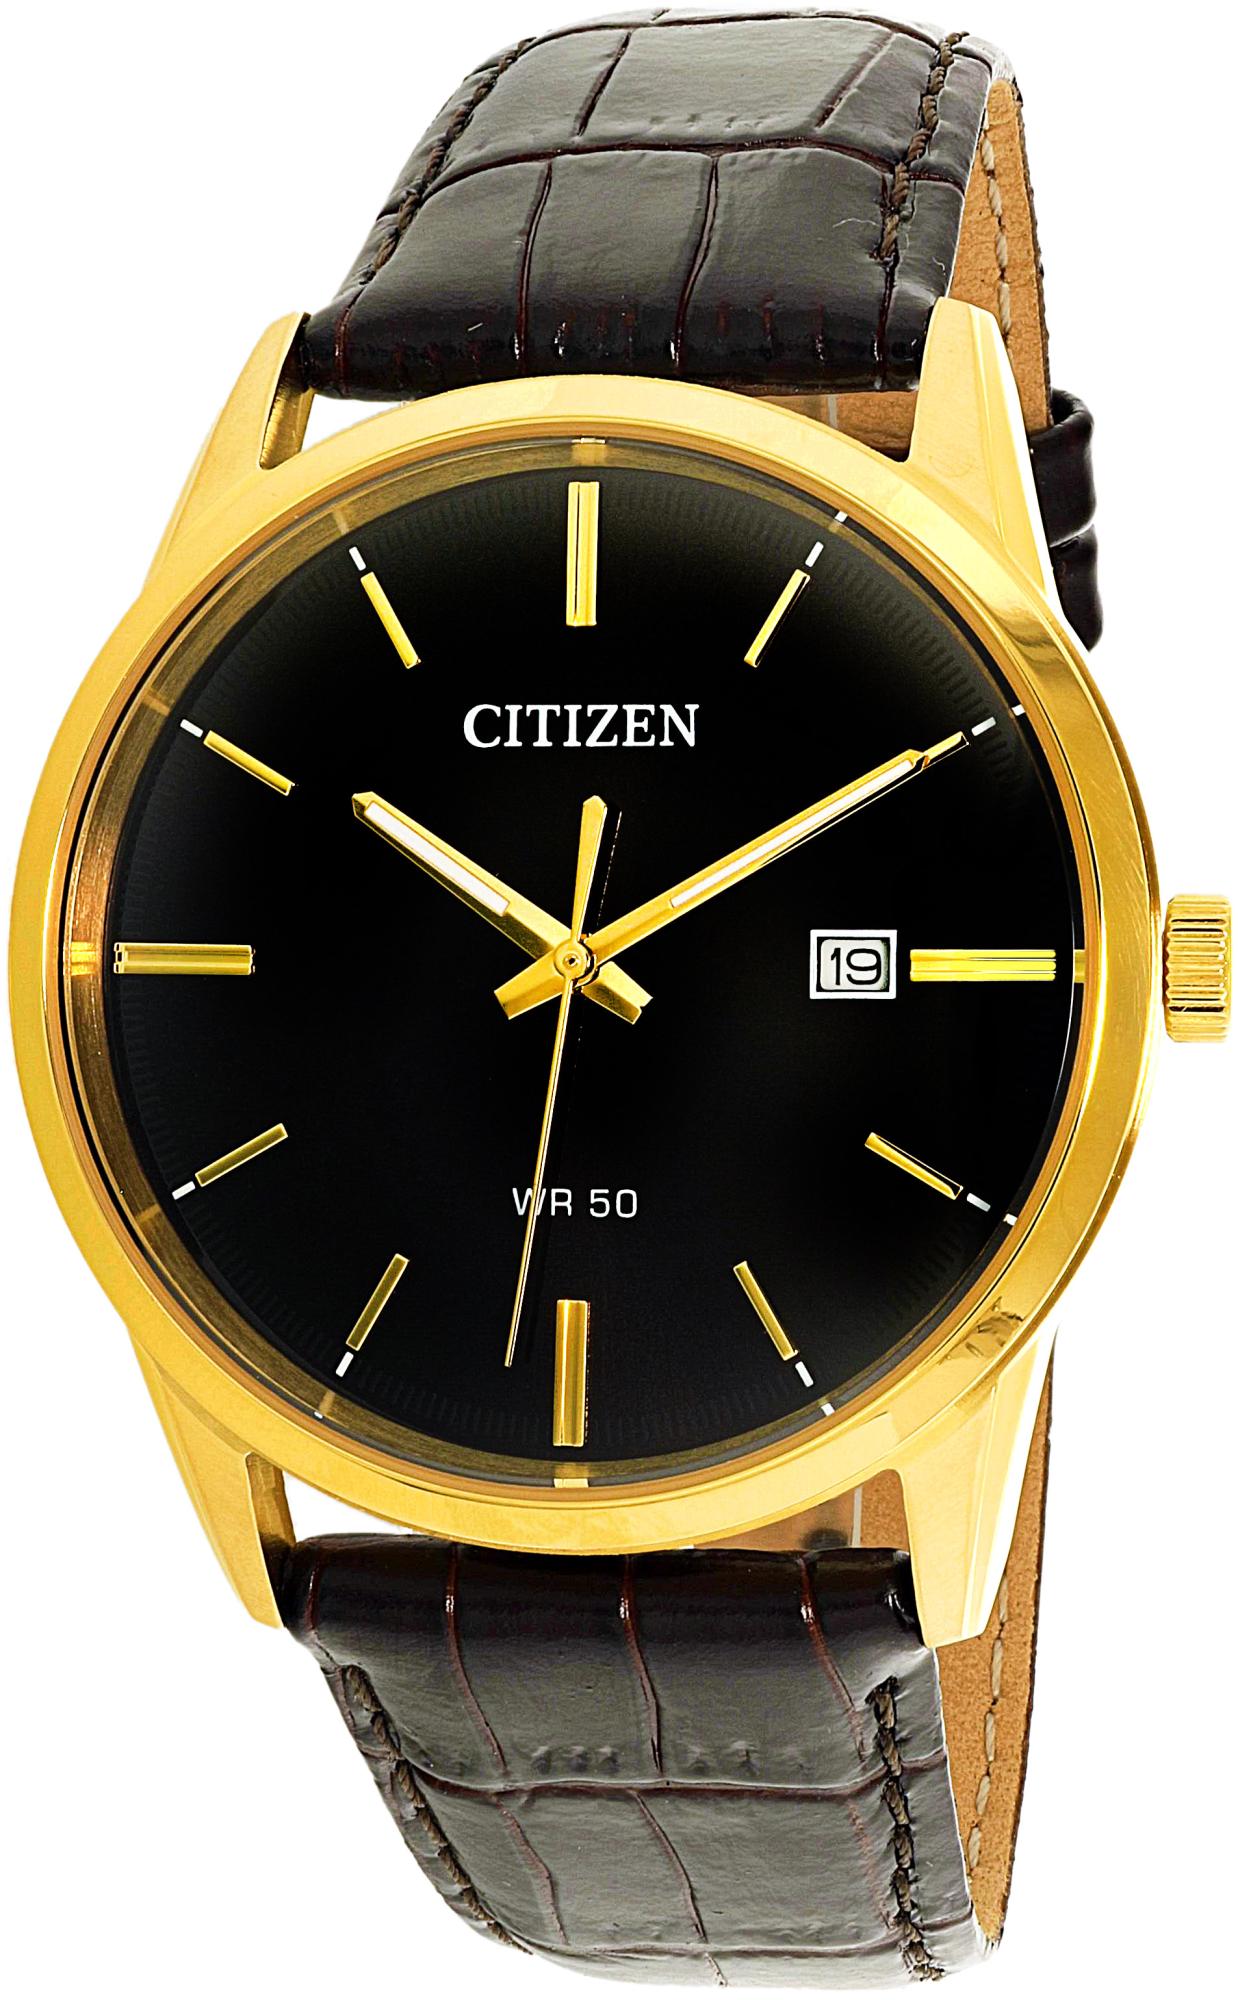 Citizen_Men's_BI5002-06E_Brown_Leather_Quartz_Fashion_Watch